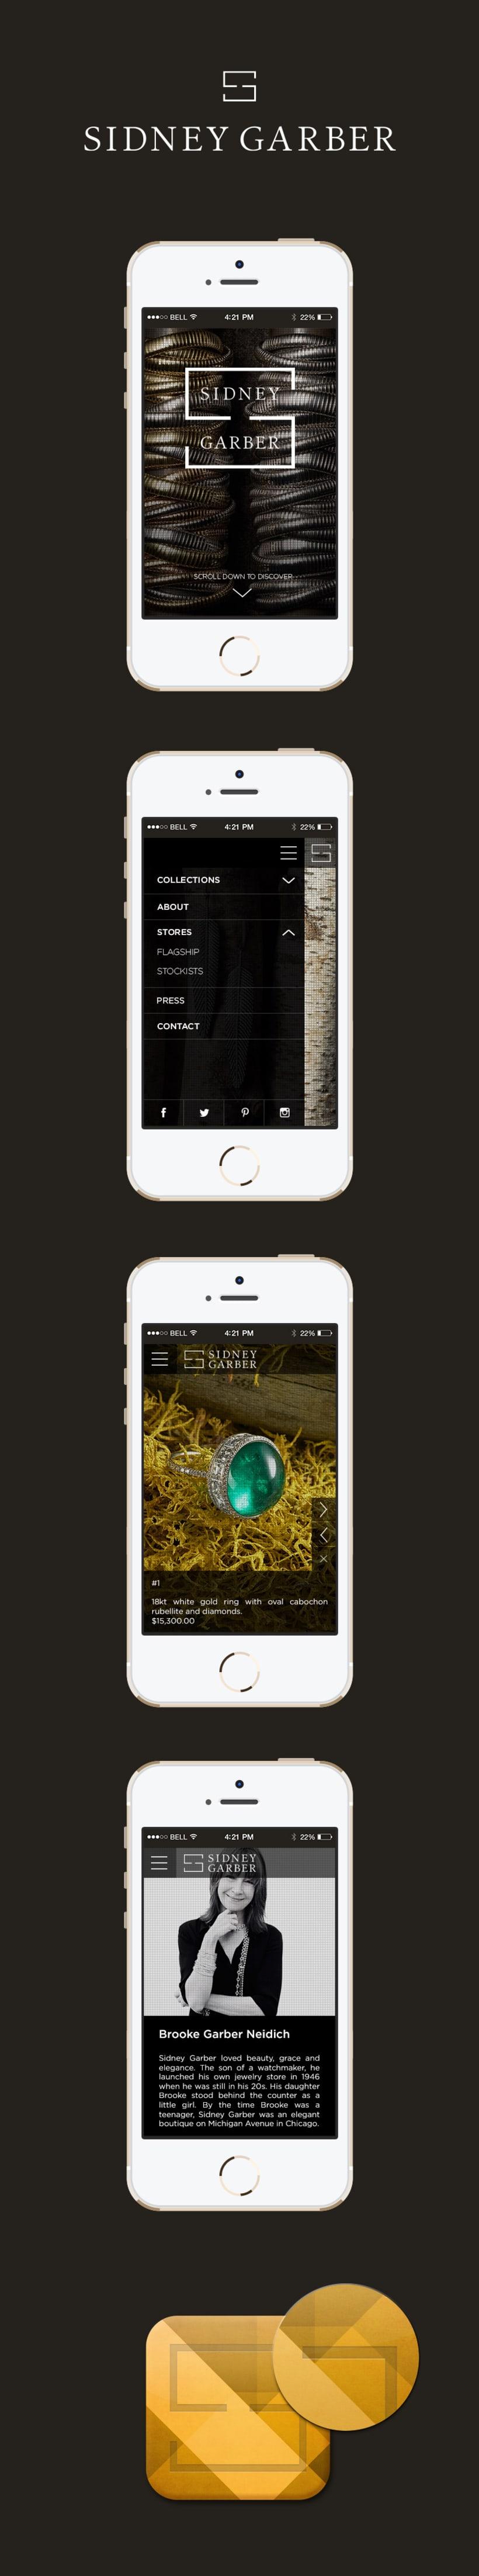 Sidney Garbar mobile app -1